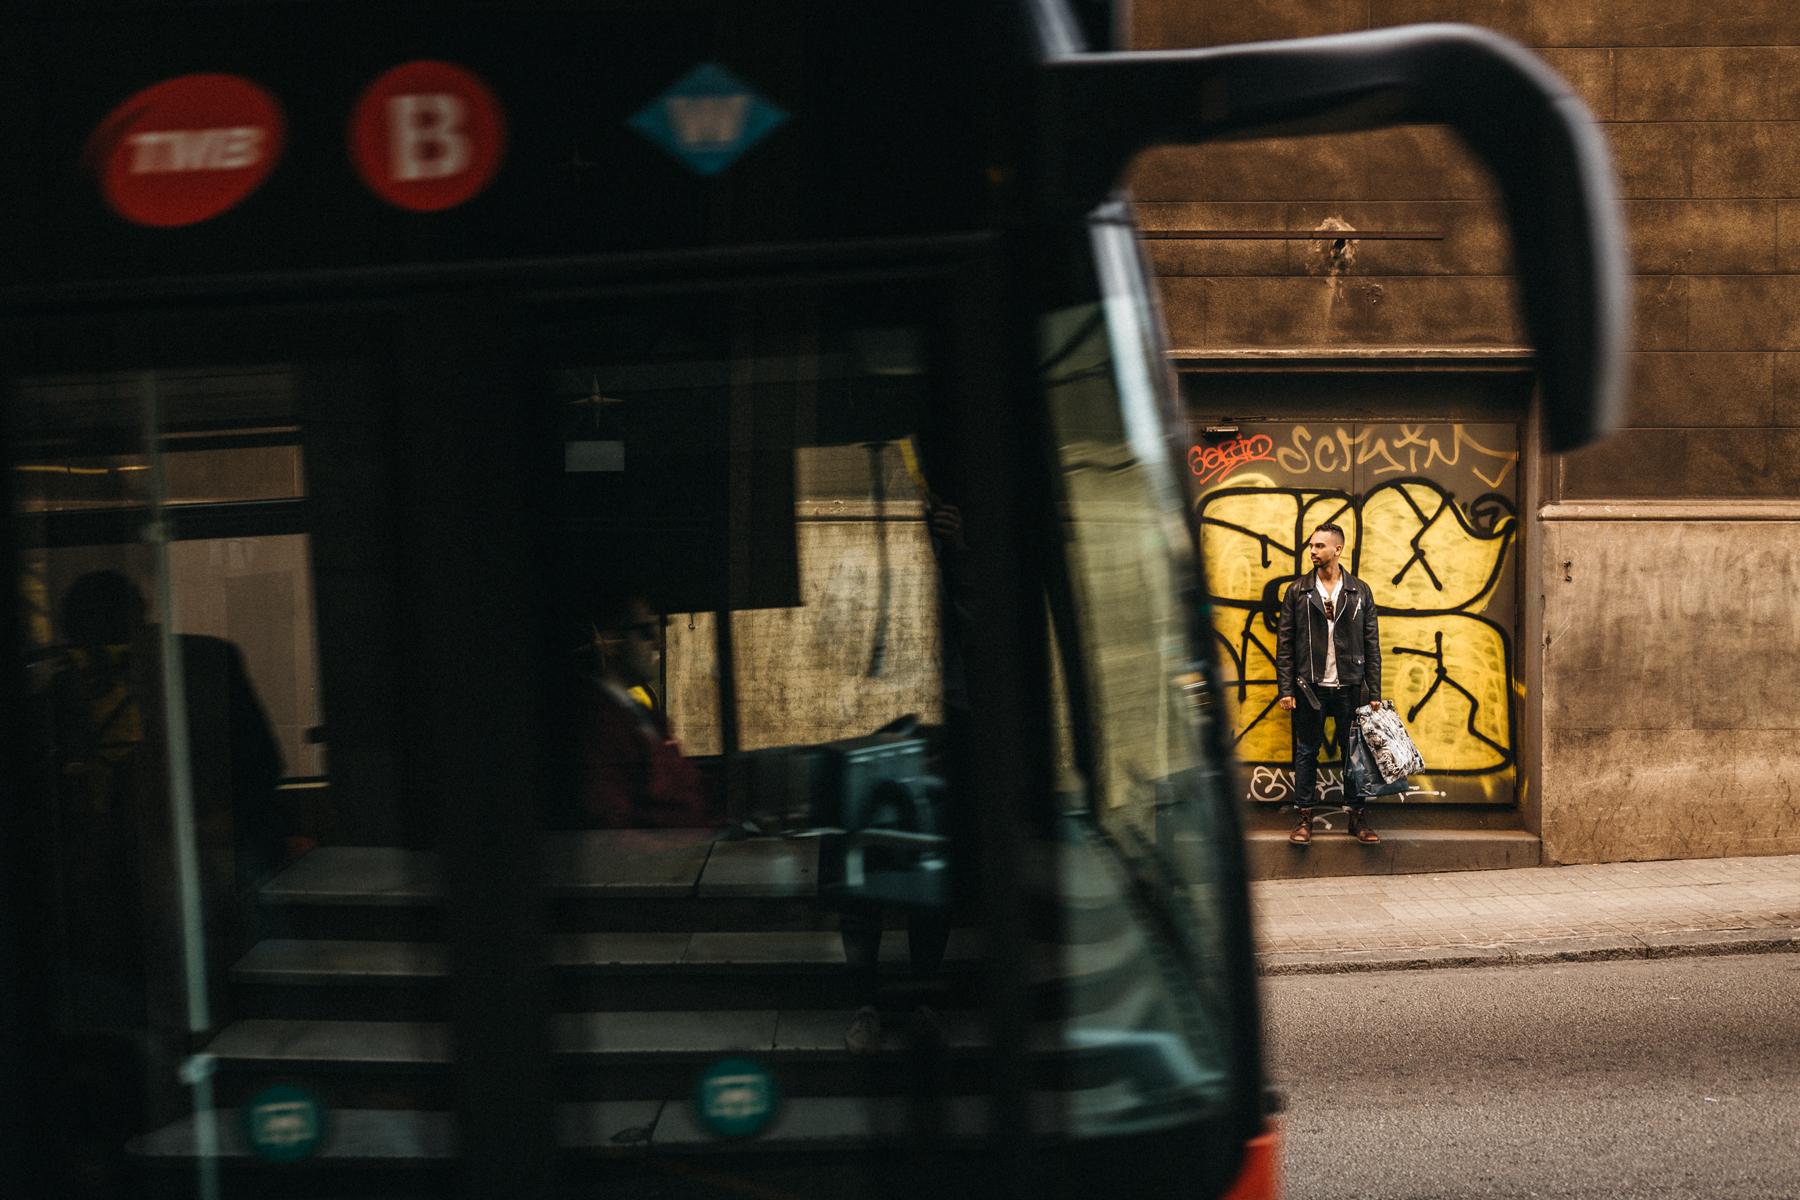 raissa simon fotografie urban coupleshooting barcelona 033 - Wietske + Stefanos